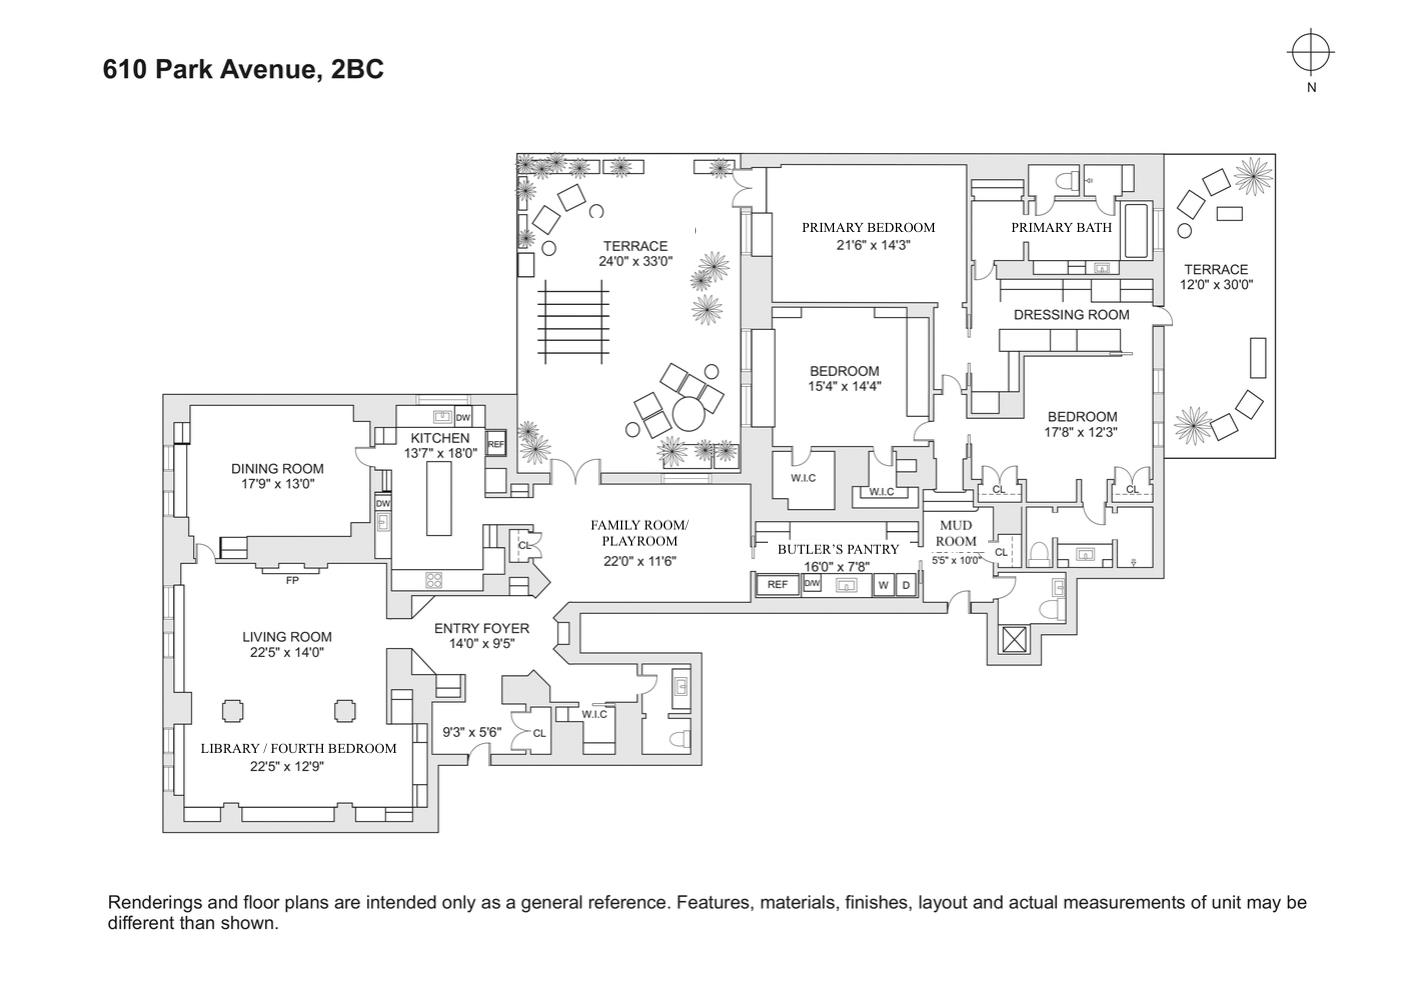 26579 floorplan